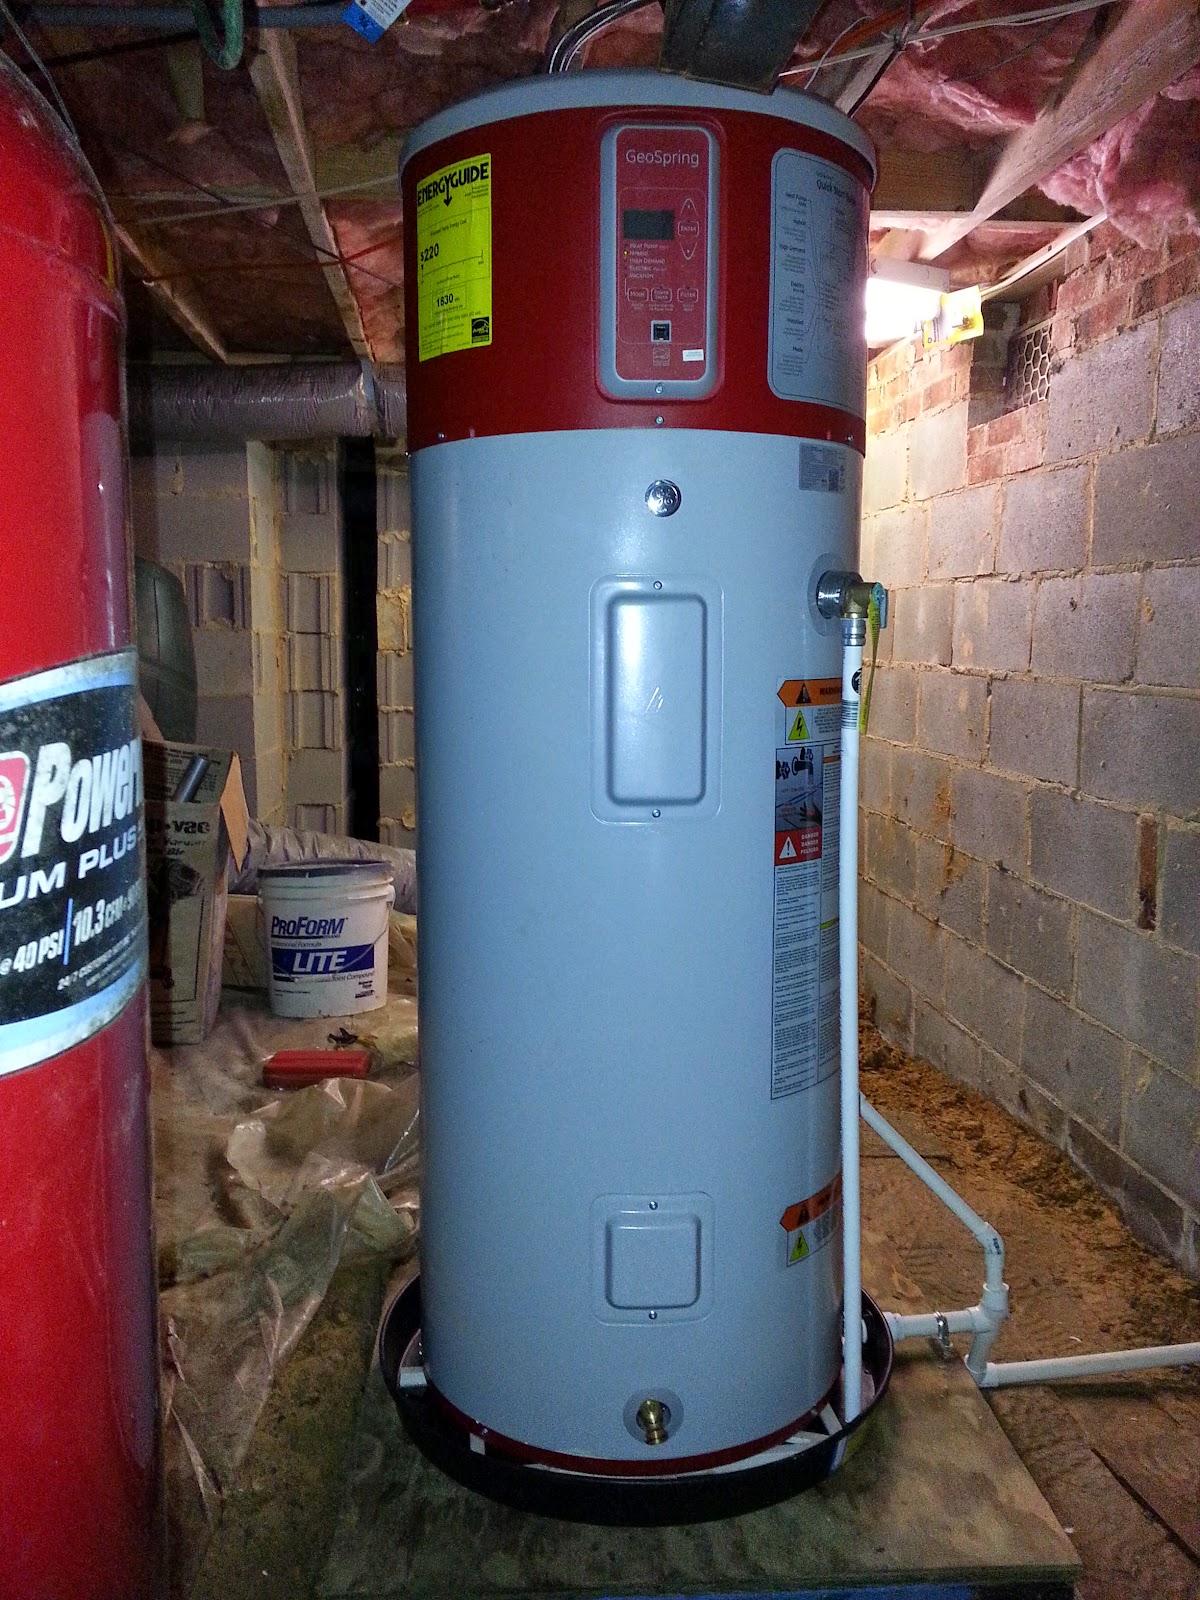 Ge Geospring Hybrid Heat Pump Water Heater